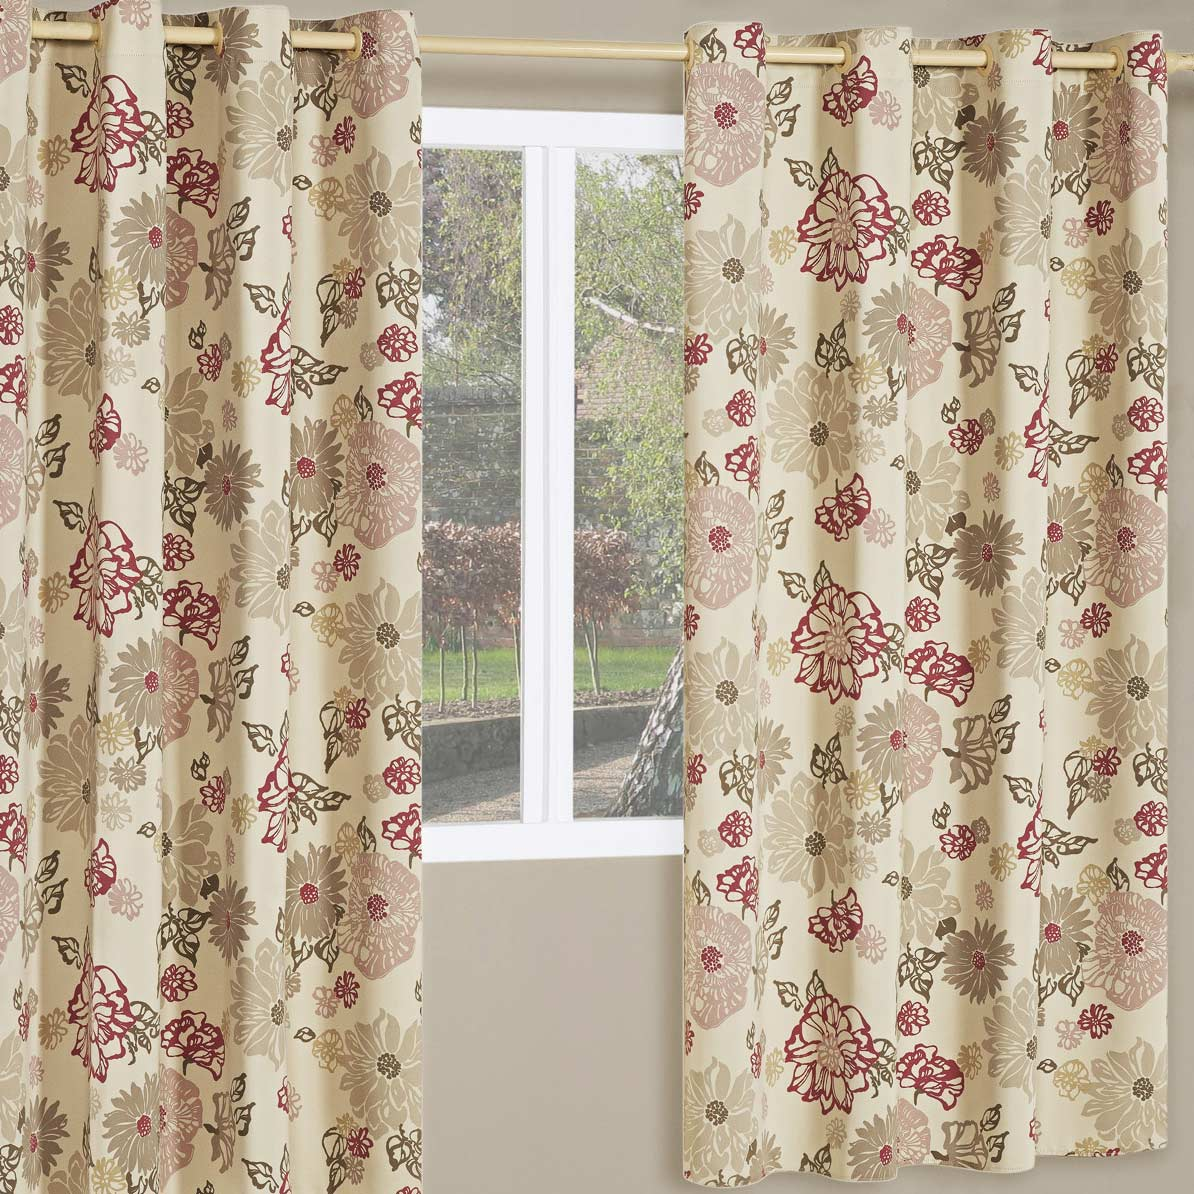 Cortina corta luz sol 2 metros floral vermelho com 1 pe as for Tipos de ganchos para cortinas